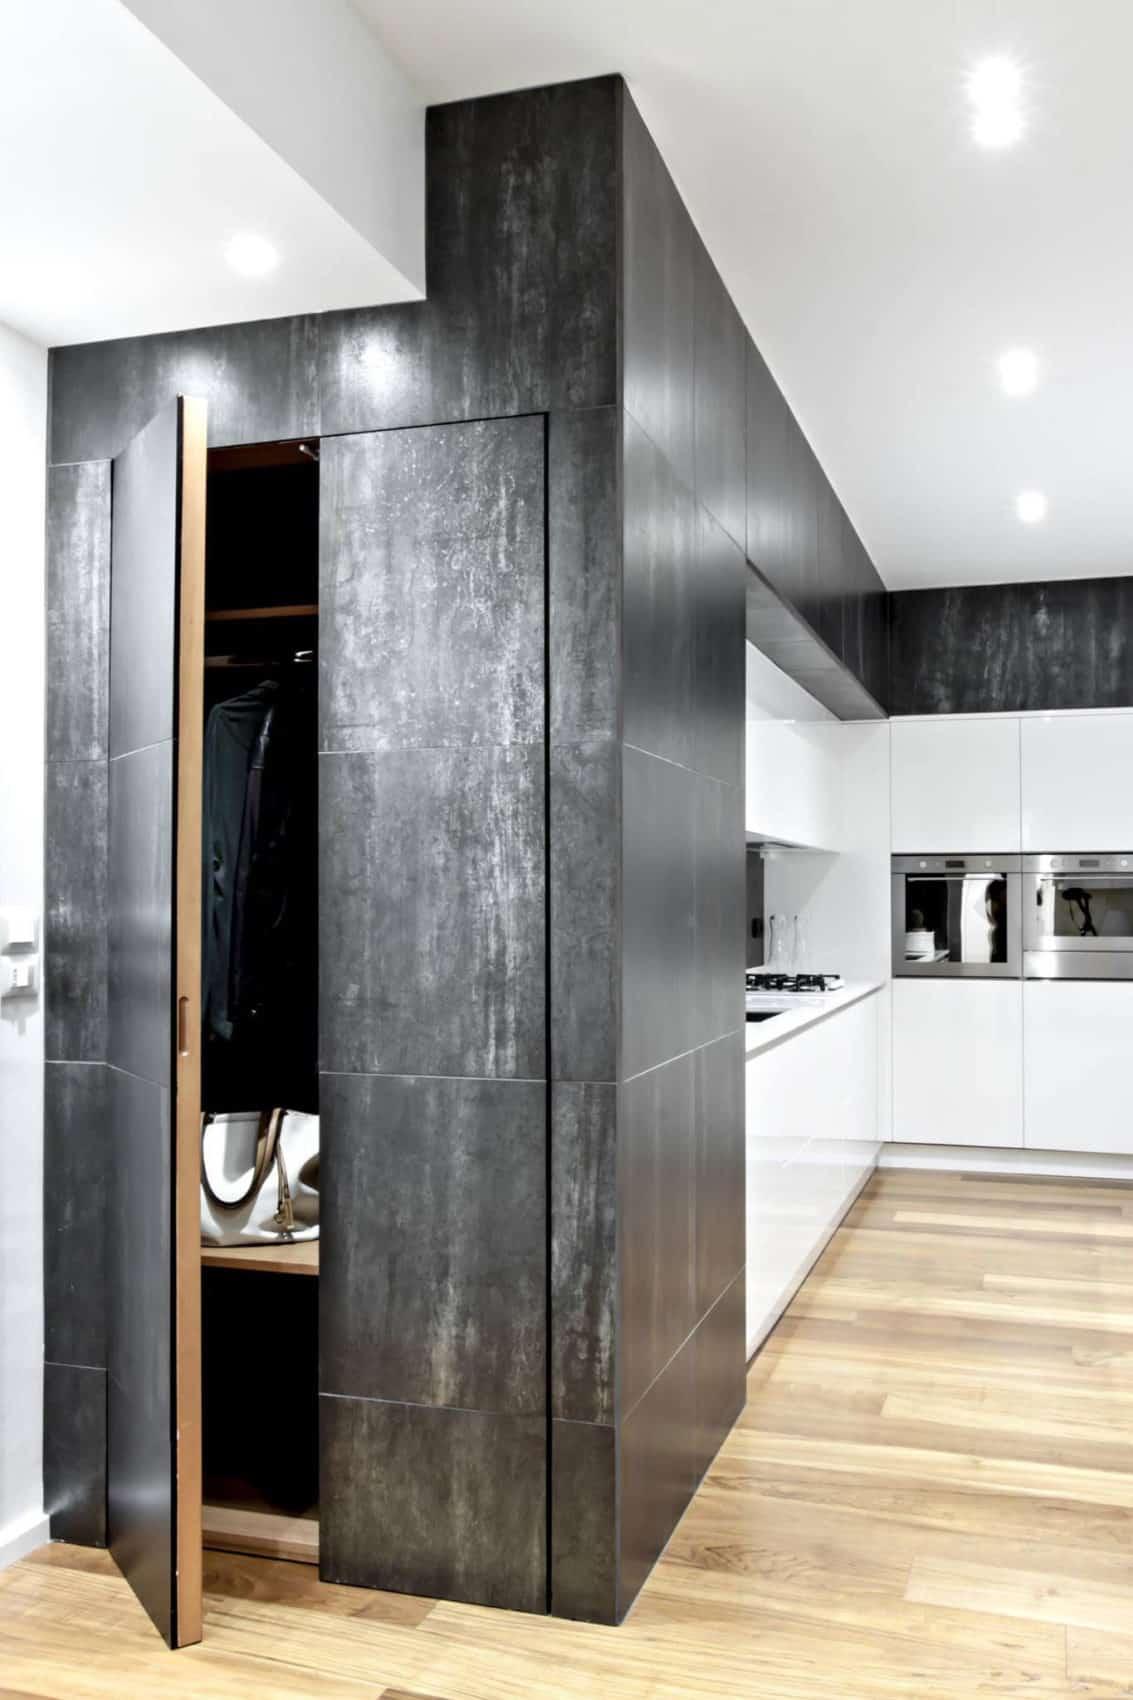 SG House by m12 architettura design (1)